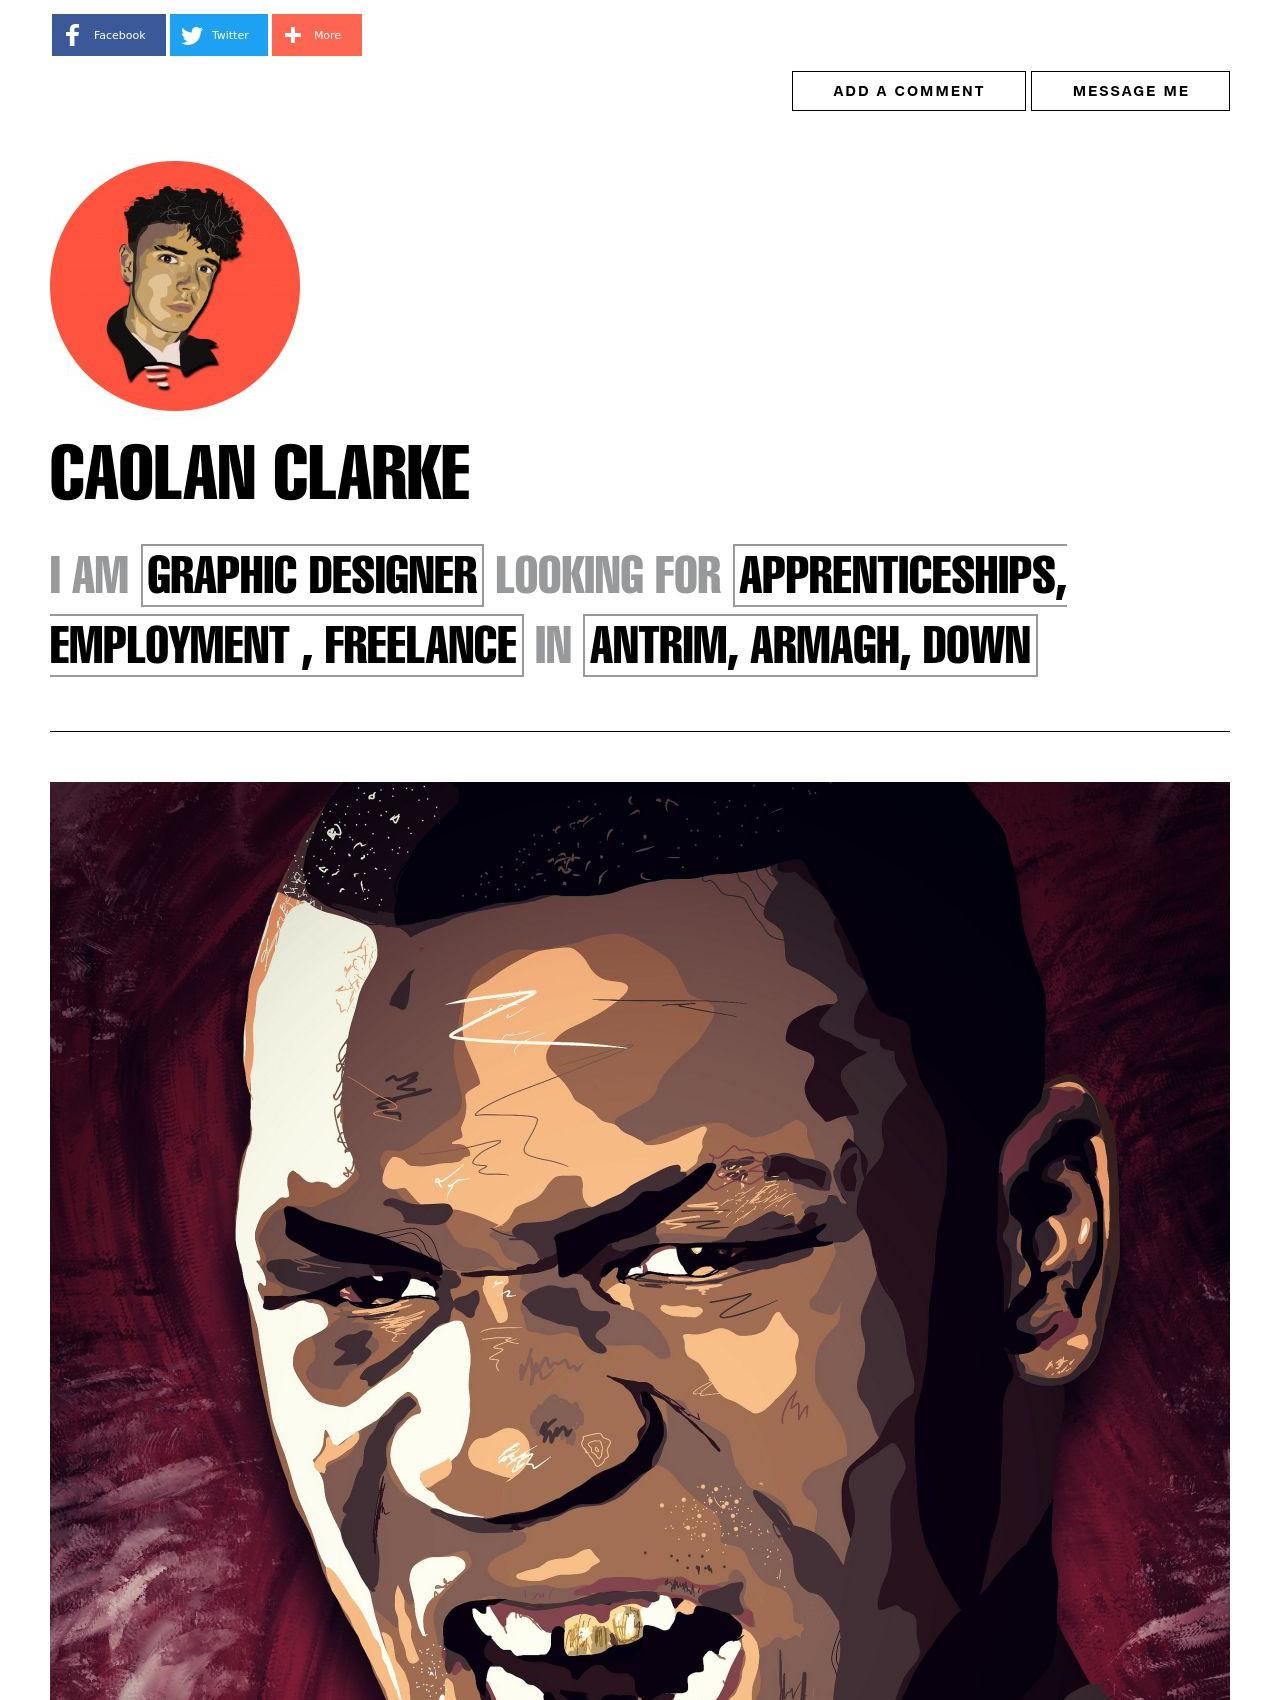 Caolan Clarke